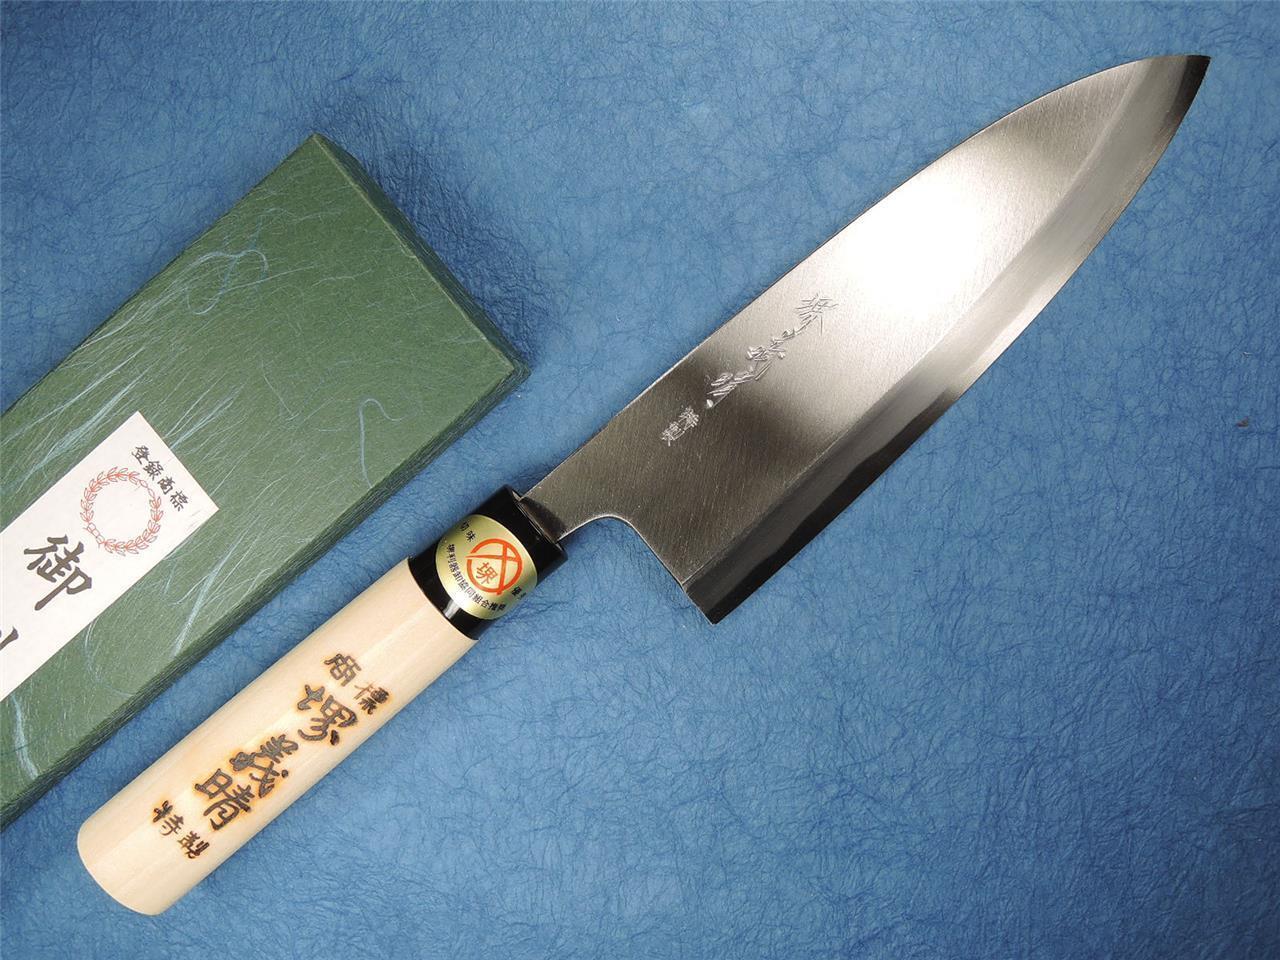 Japonais SAKAI Carbon Steel Deba Knife 180 mm